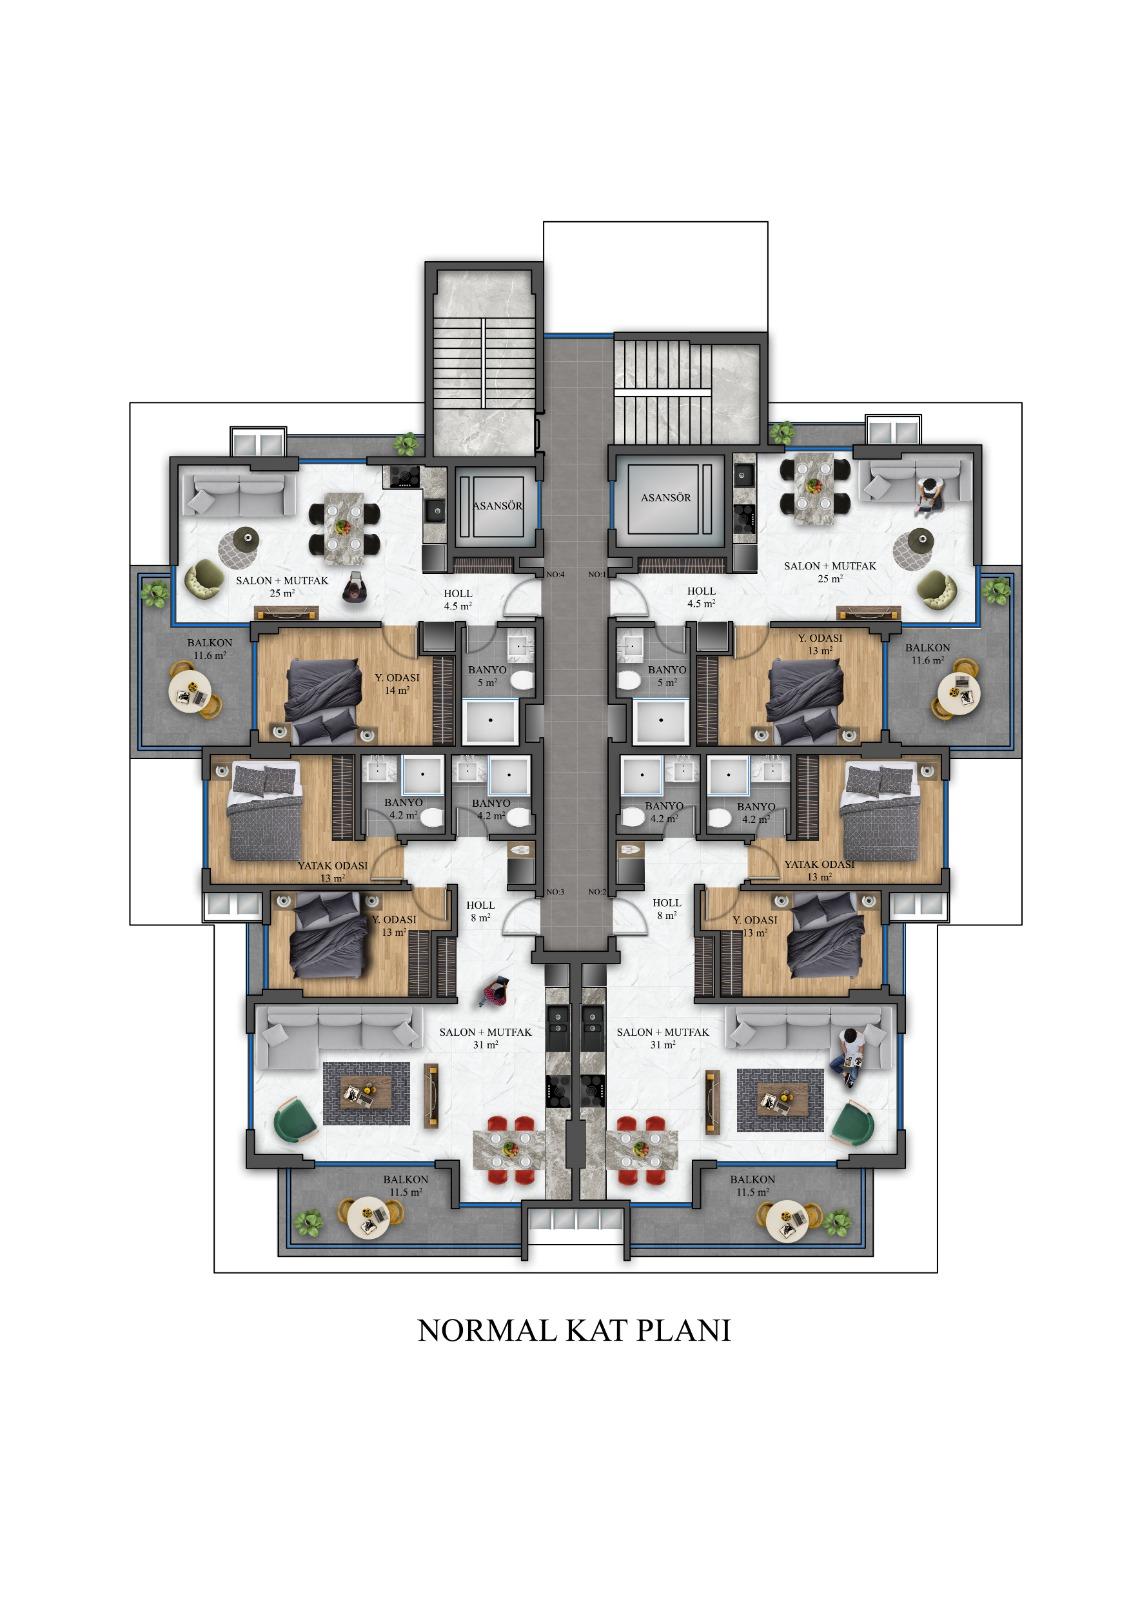 Квартиры в инвестиционном проекте по ценам застройщика - Фото 31